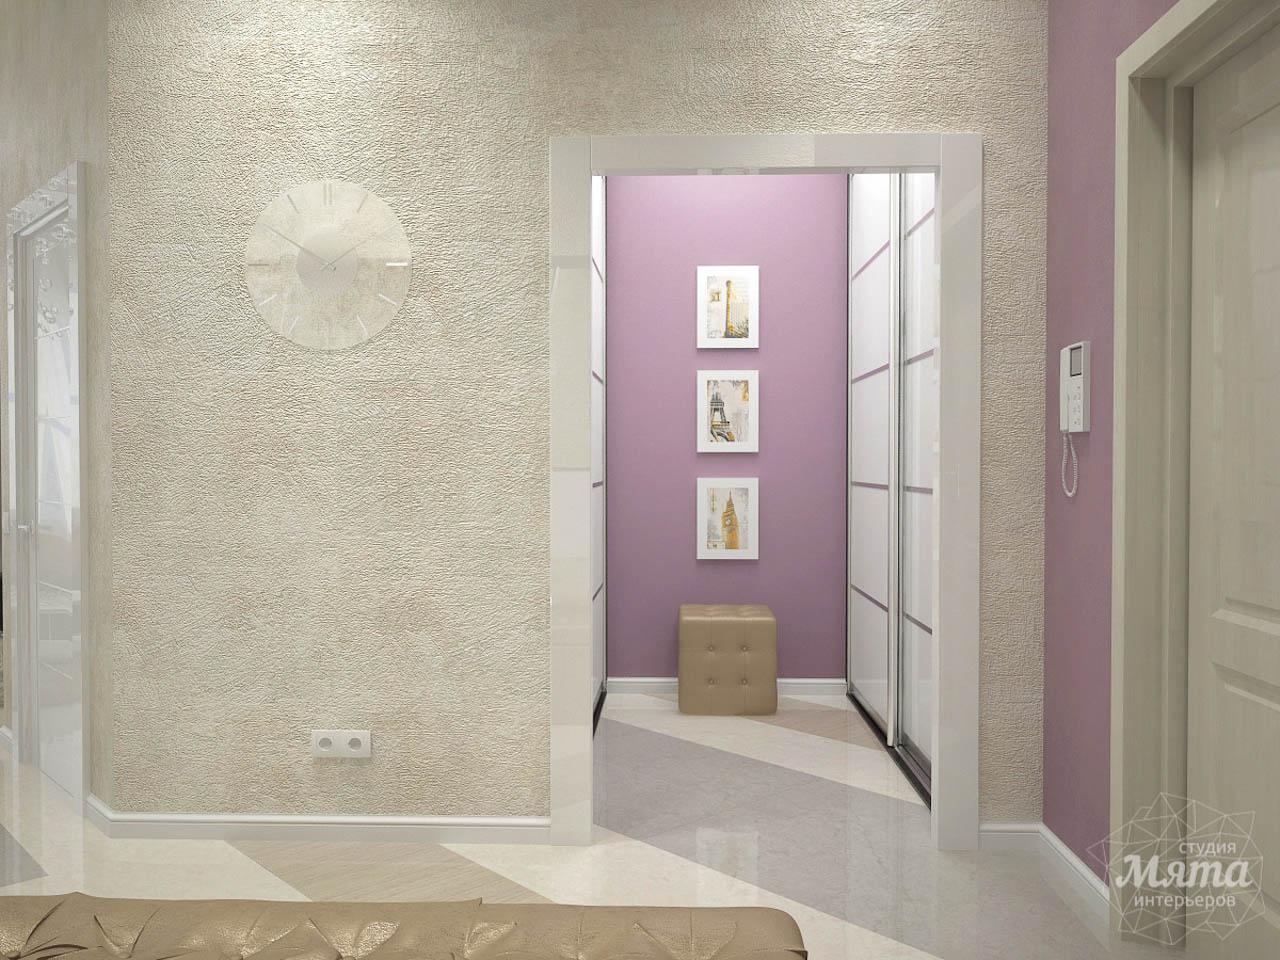 Дизайн интерьера и ремонт трехкомнатной квартиры по ул. Чкалова 124 img1604445572